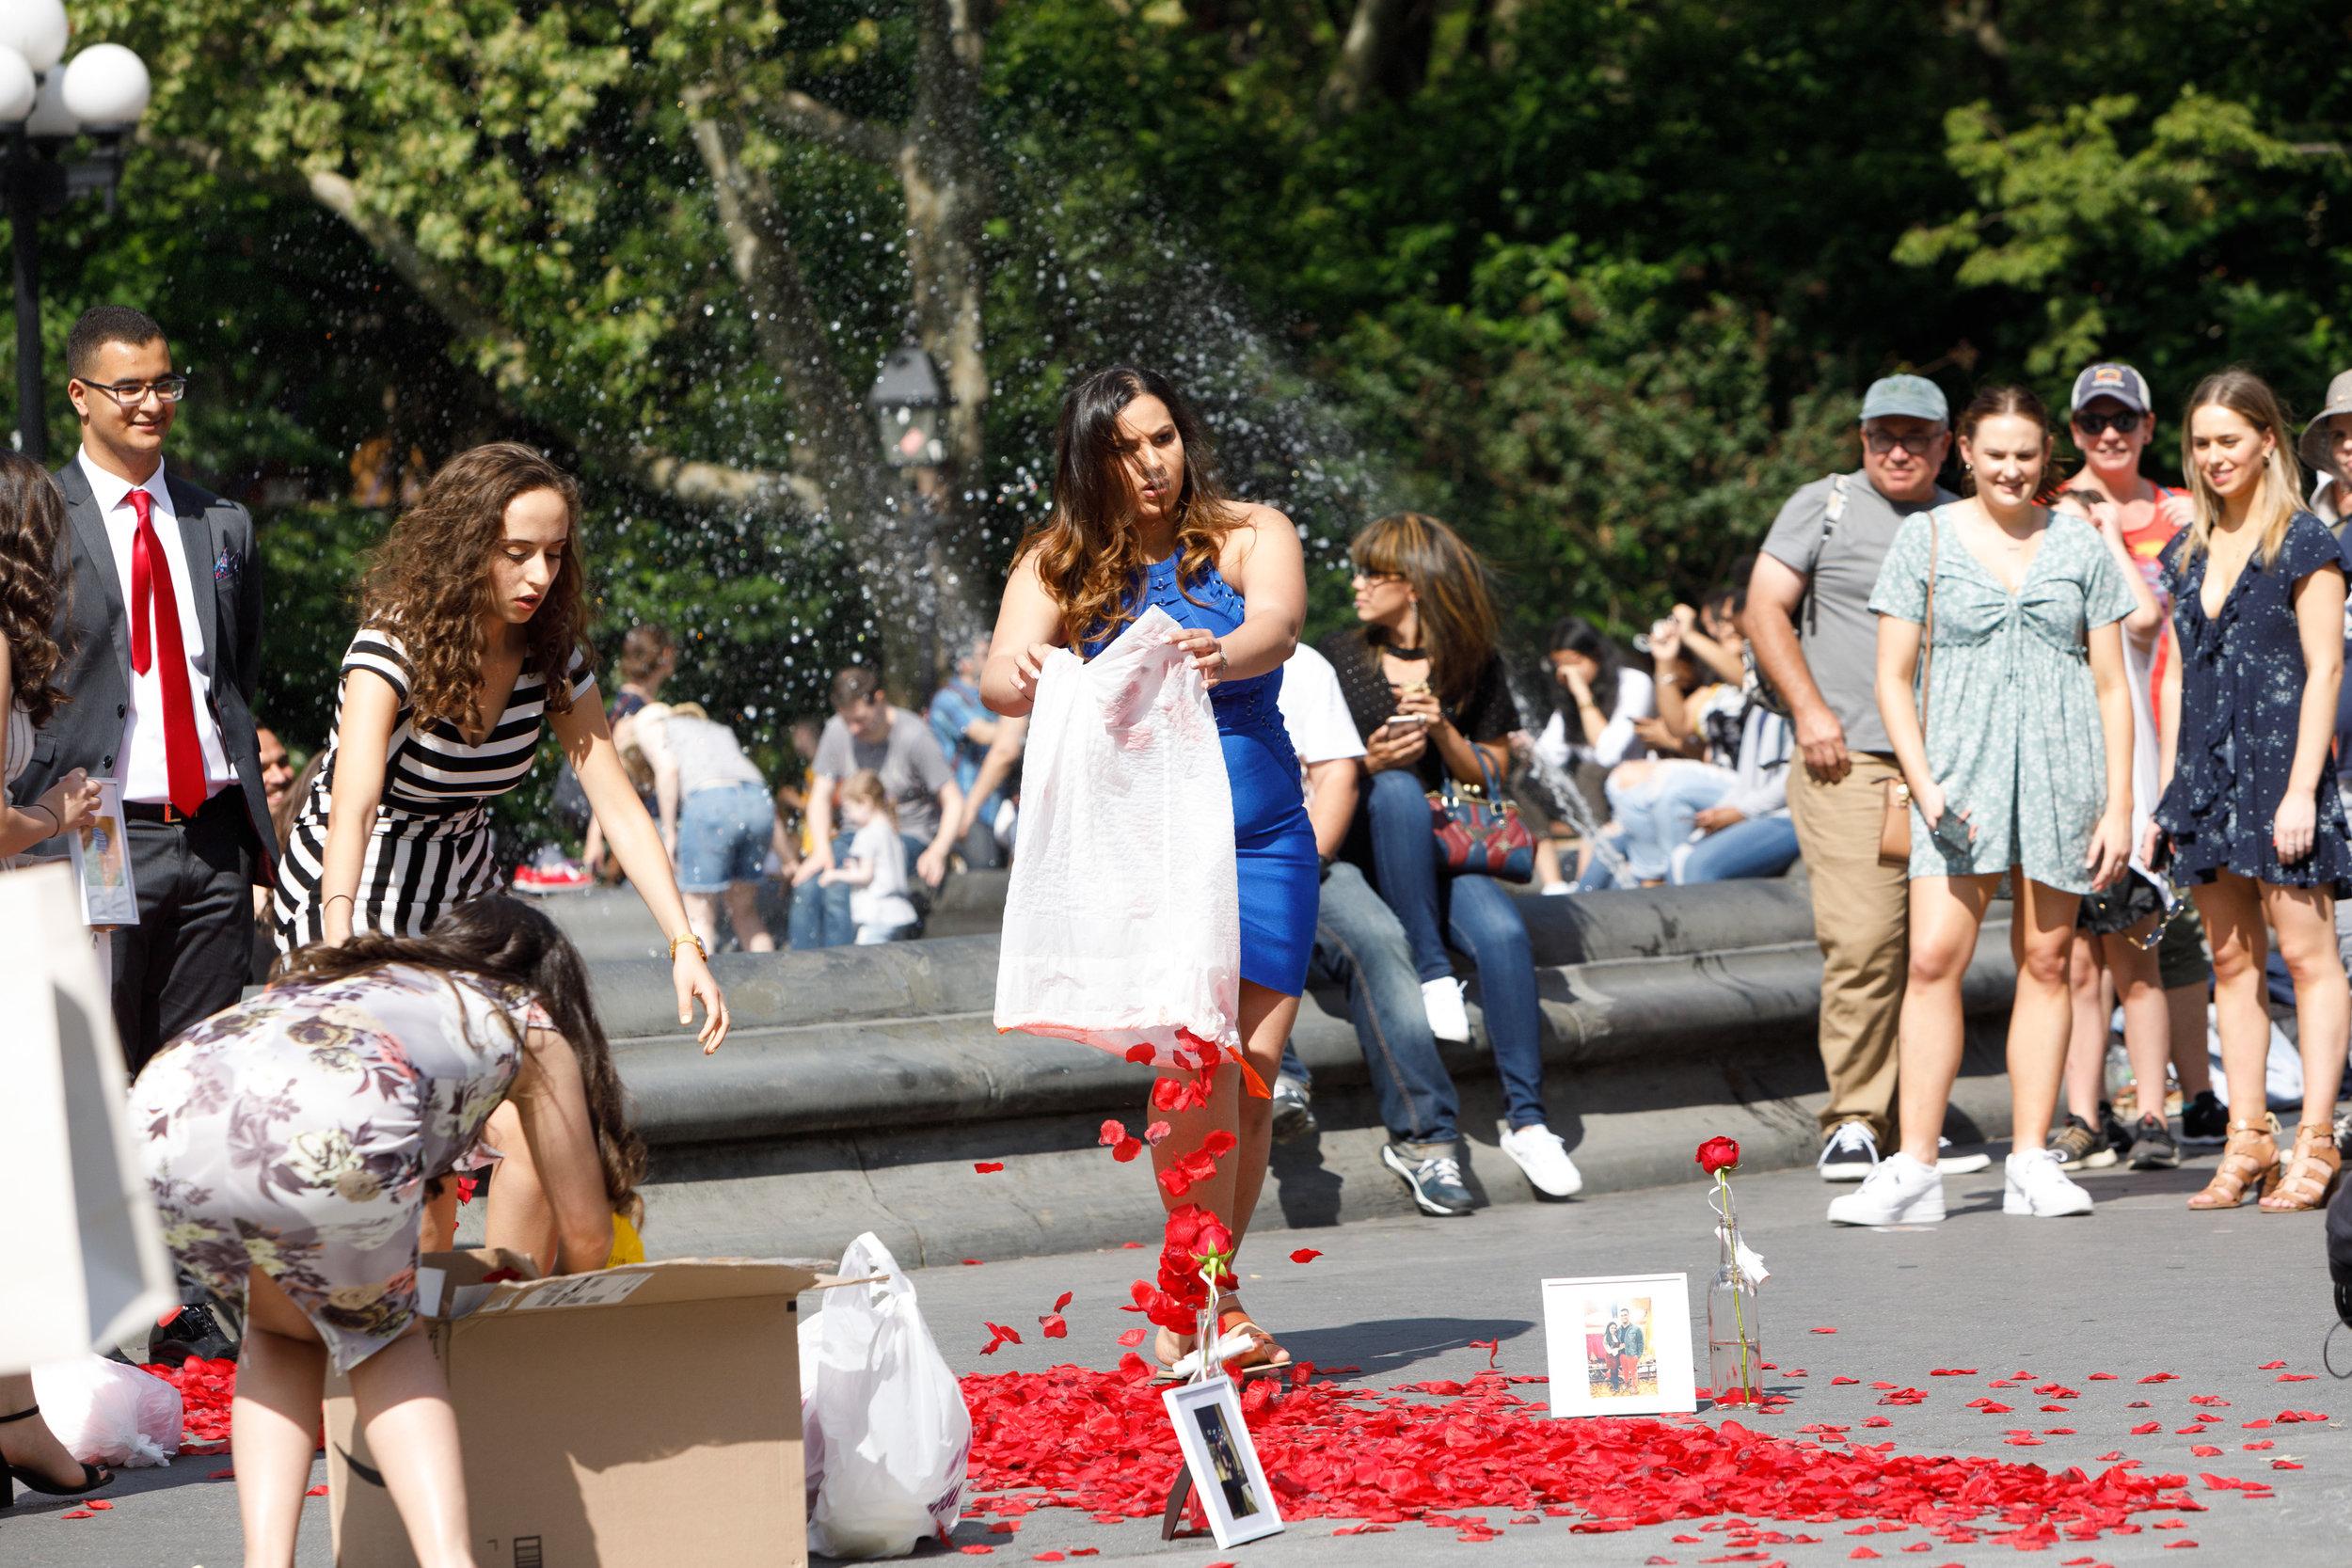 Kiro Rebecca Washington Square Park Marriage Proposal _ Jonathan Heisler _ 6152019 _005.jpg